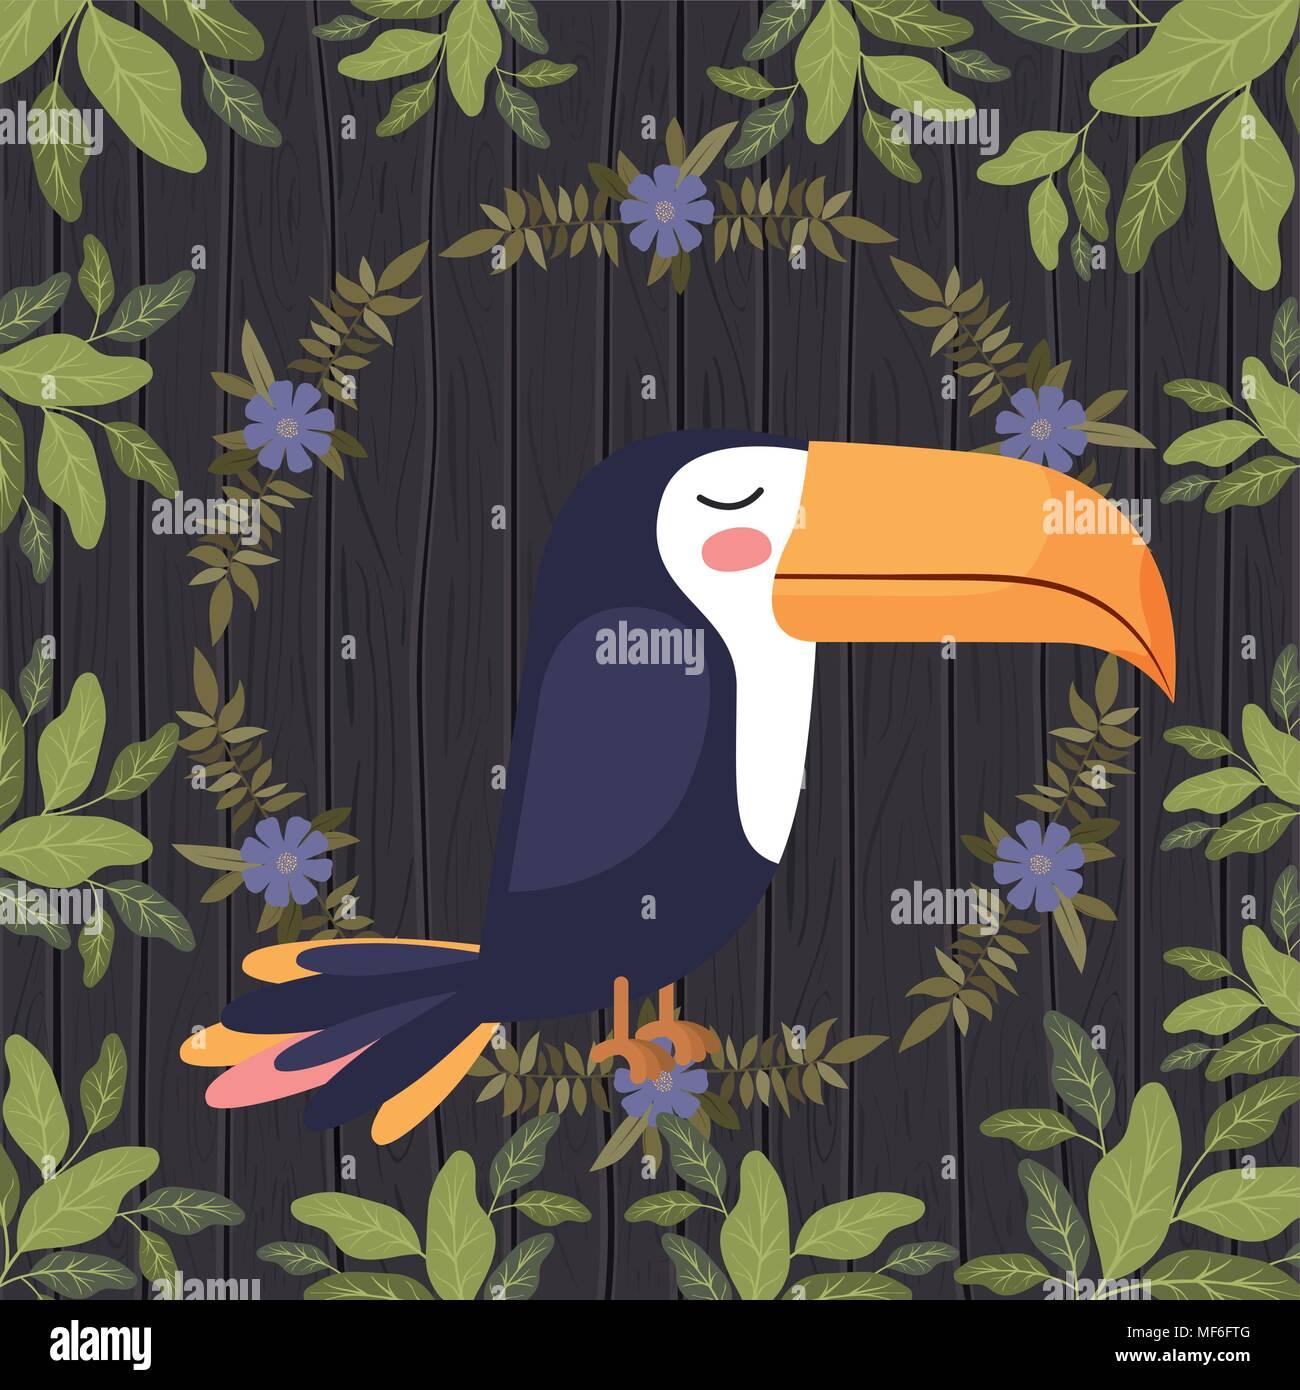 cute toucan bird in forest scape scene vector illustration